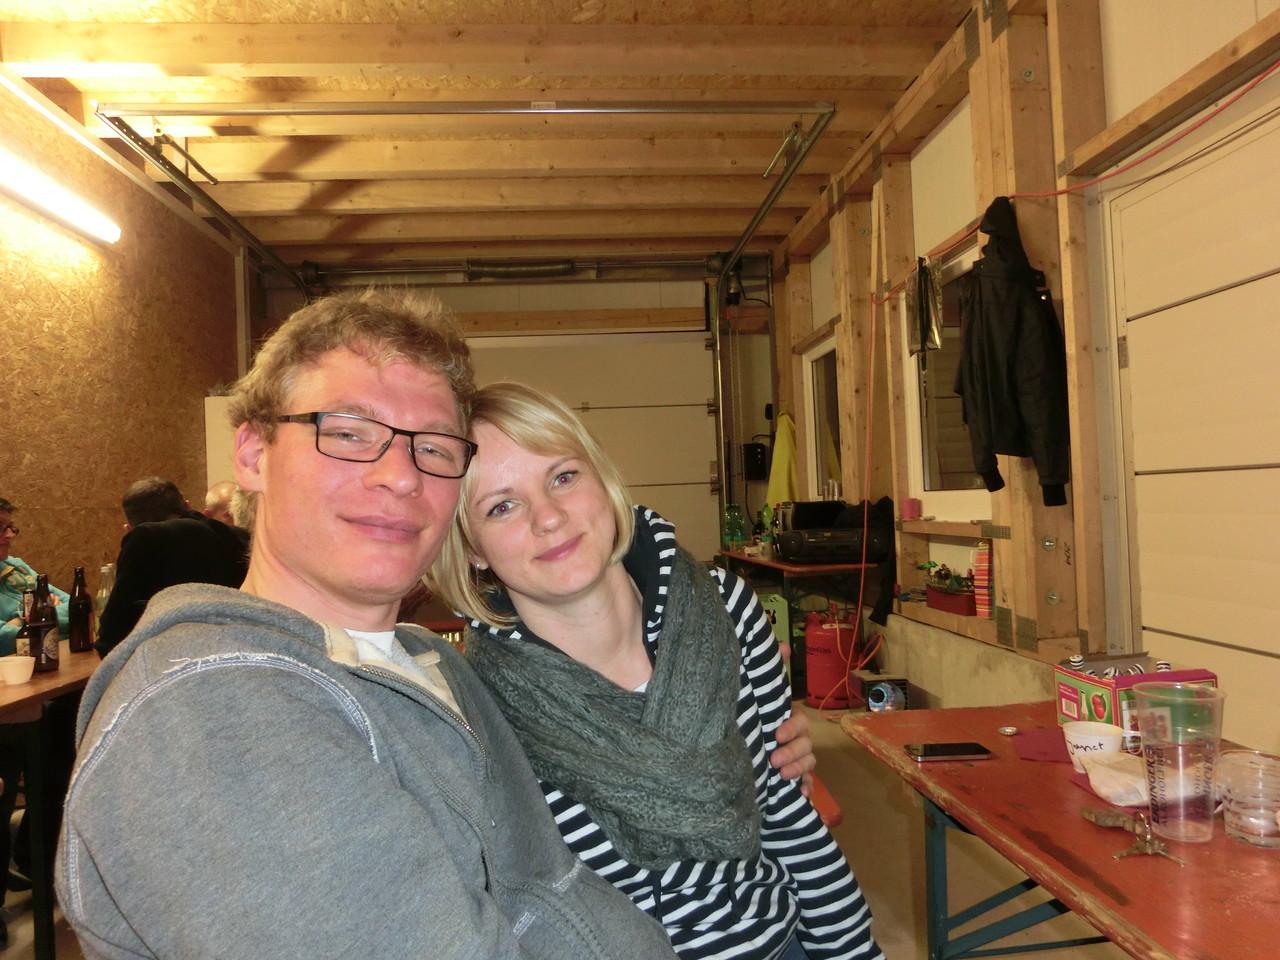 Simon und Jeanette, Marcs Freunde aus München